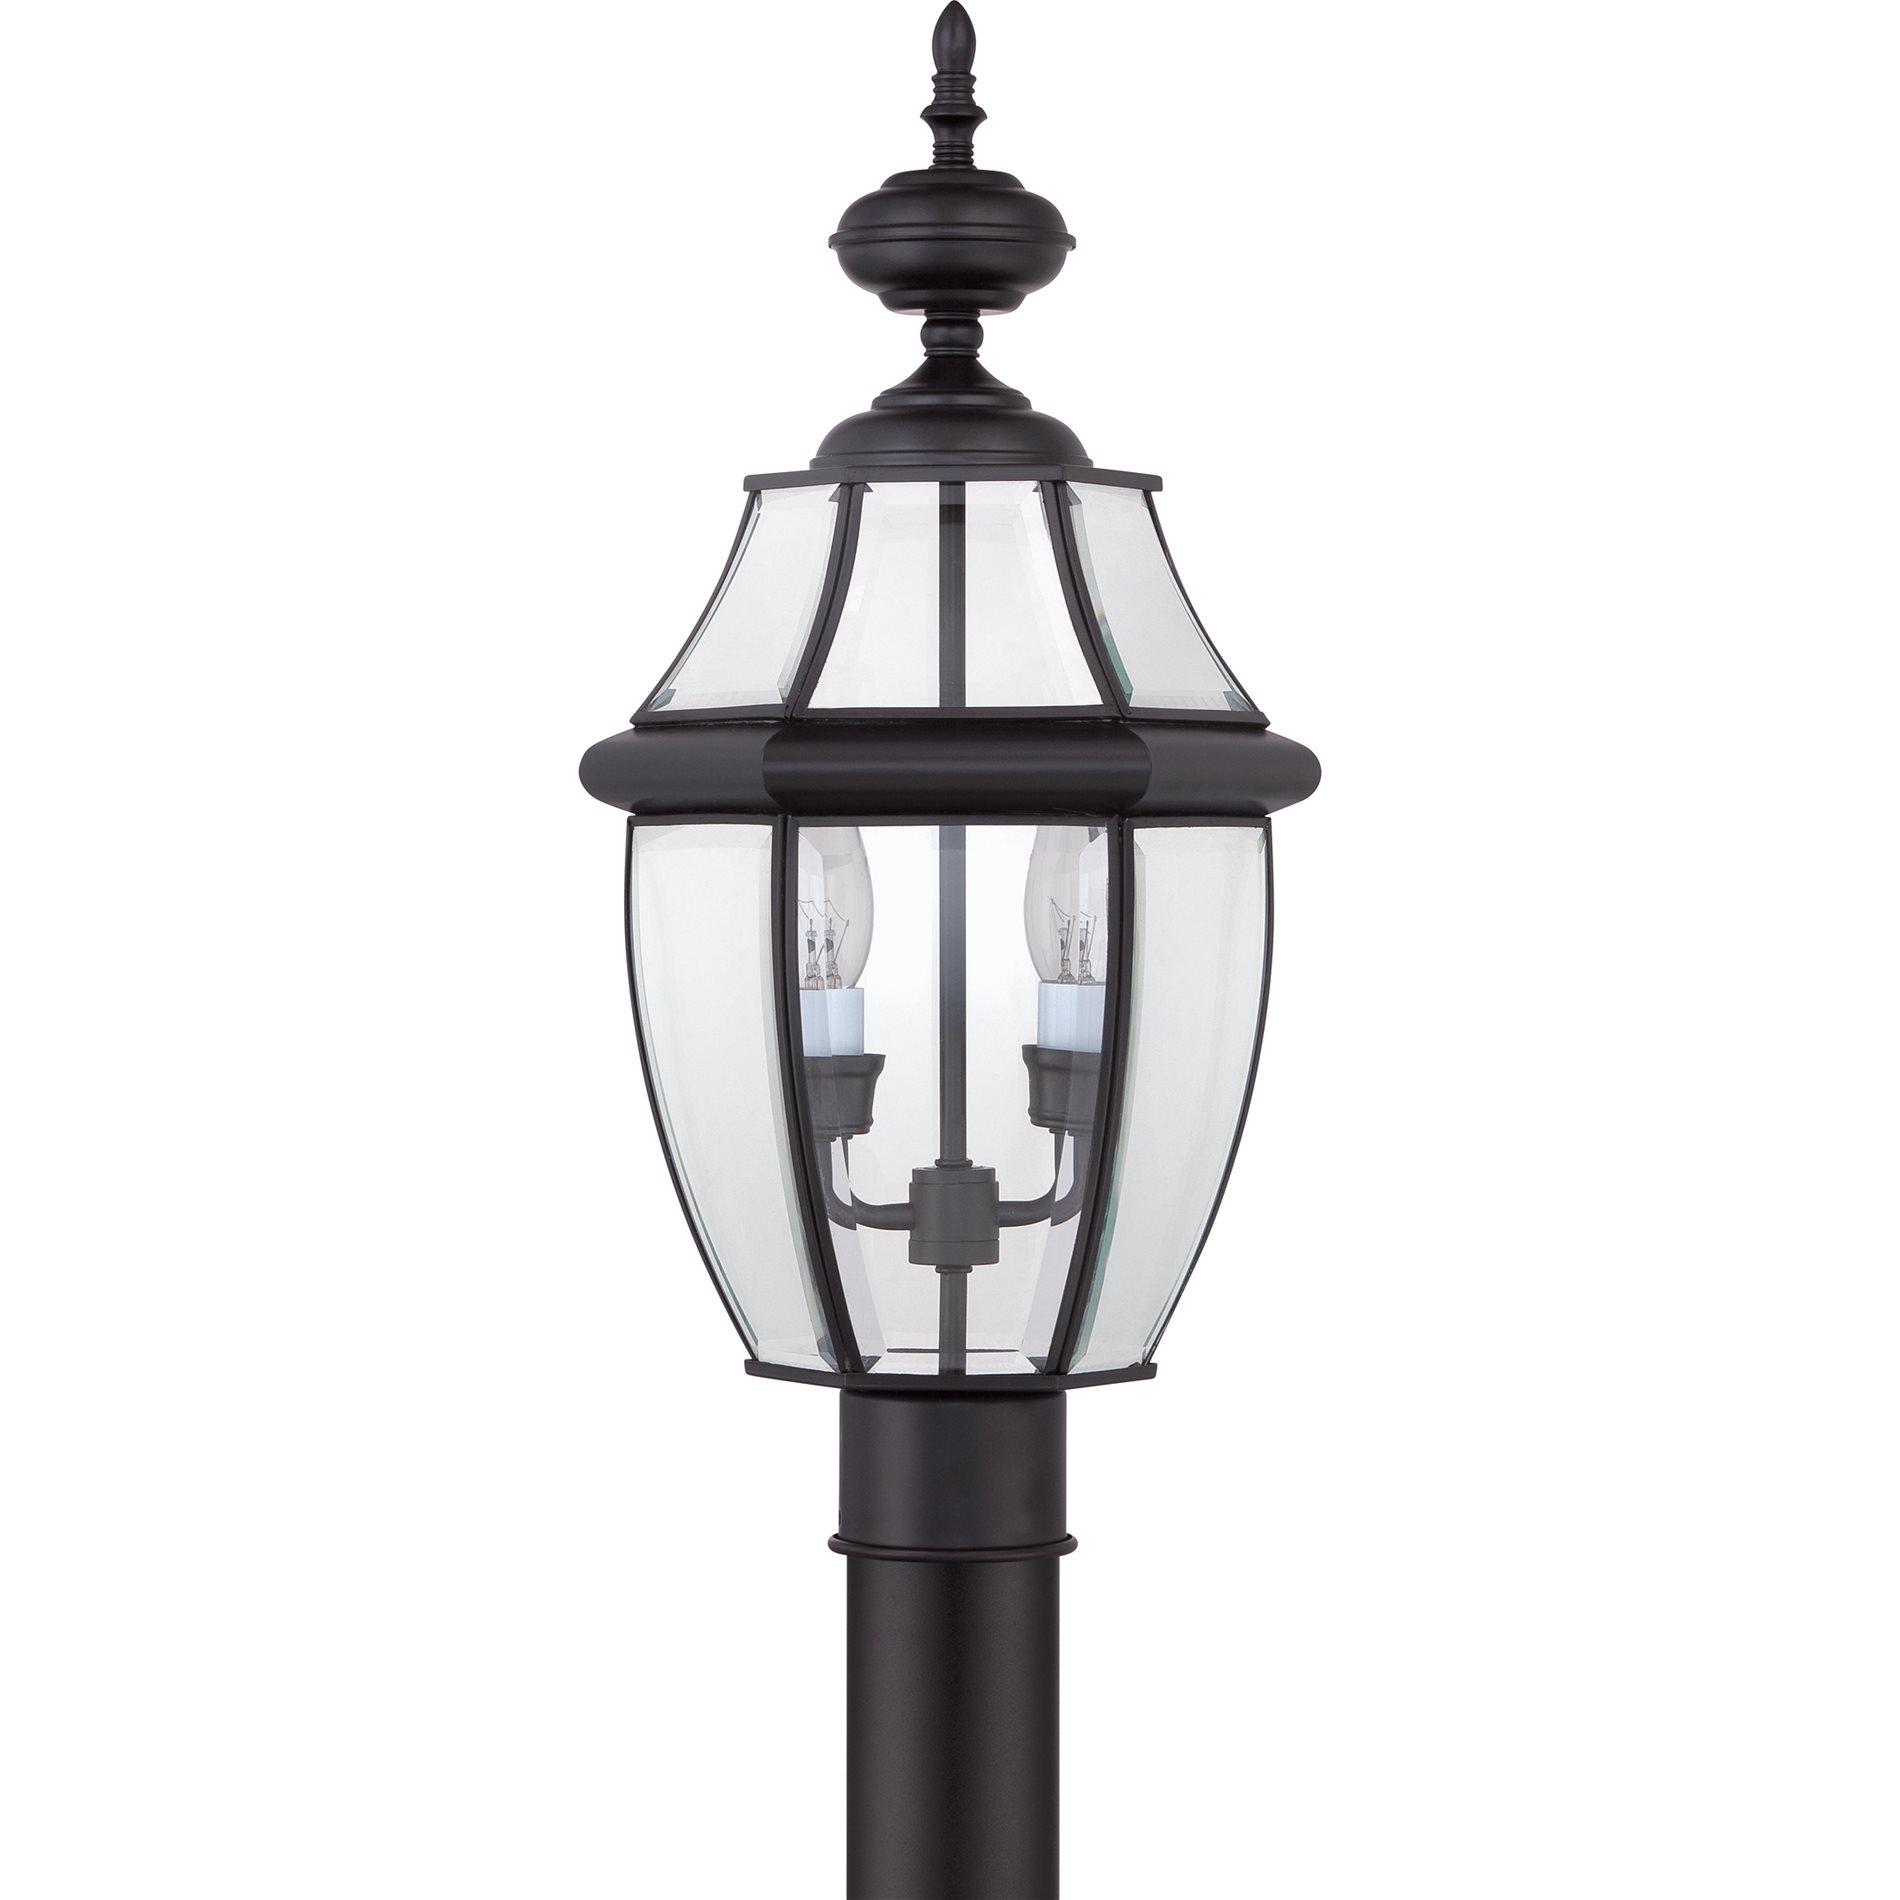 Quoizel NY9042K Newbury Traditional Outdoor Post Lantern